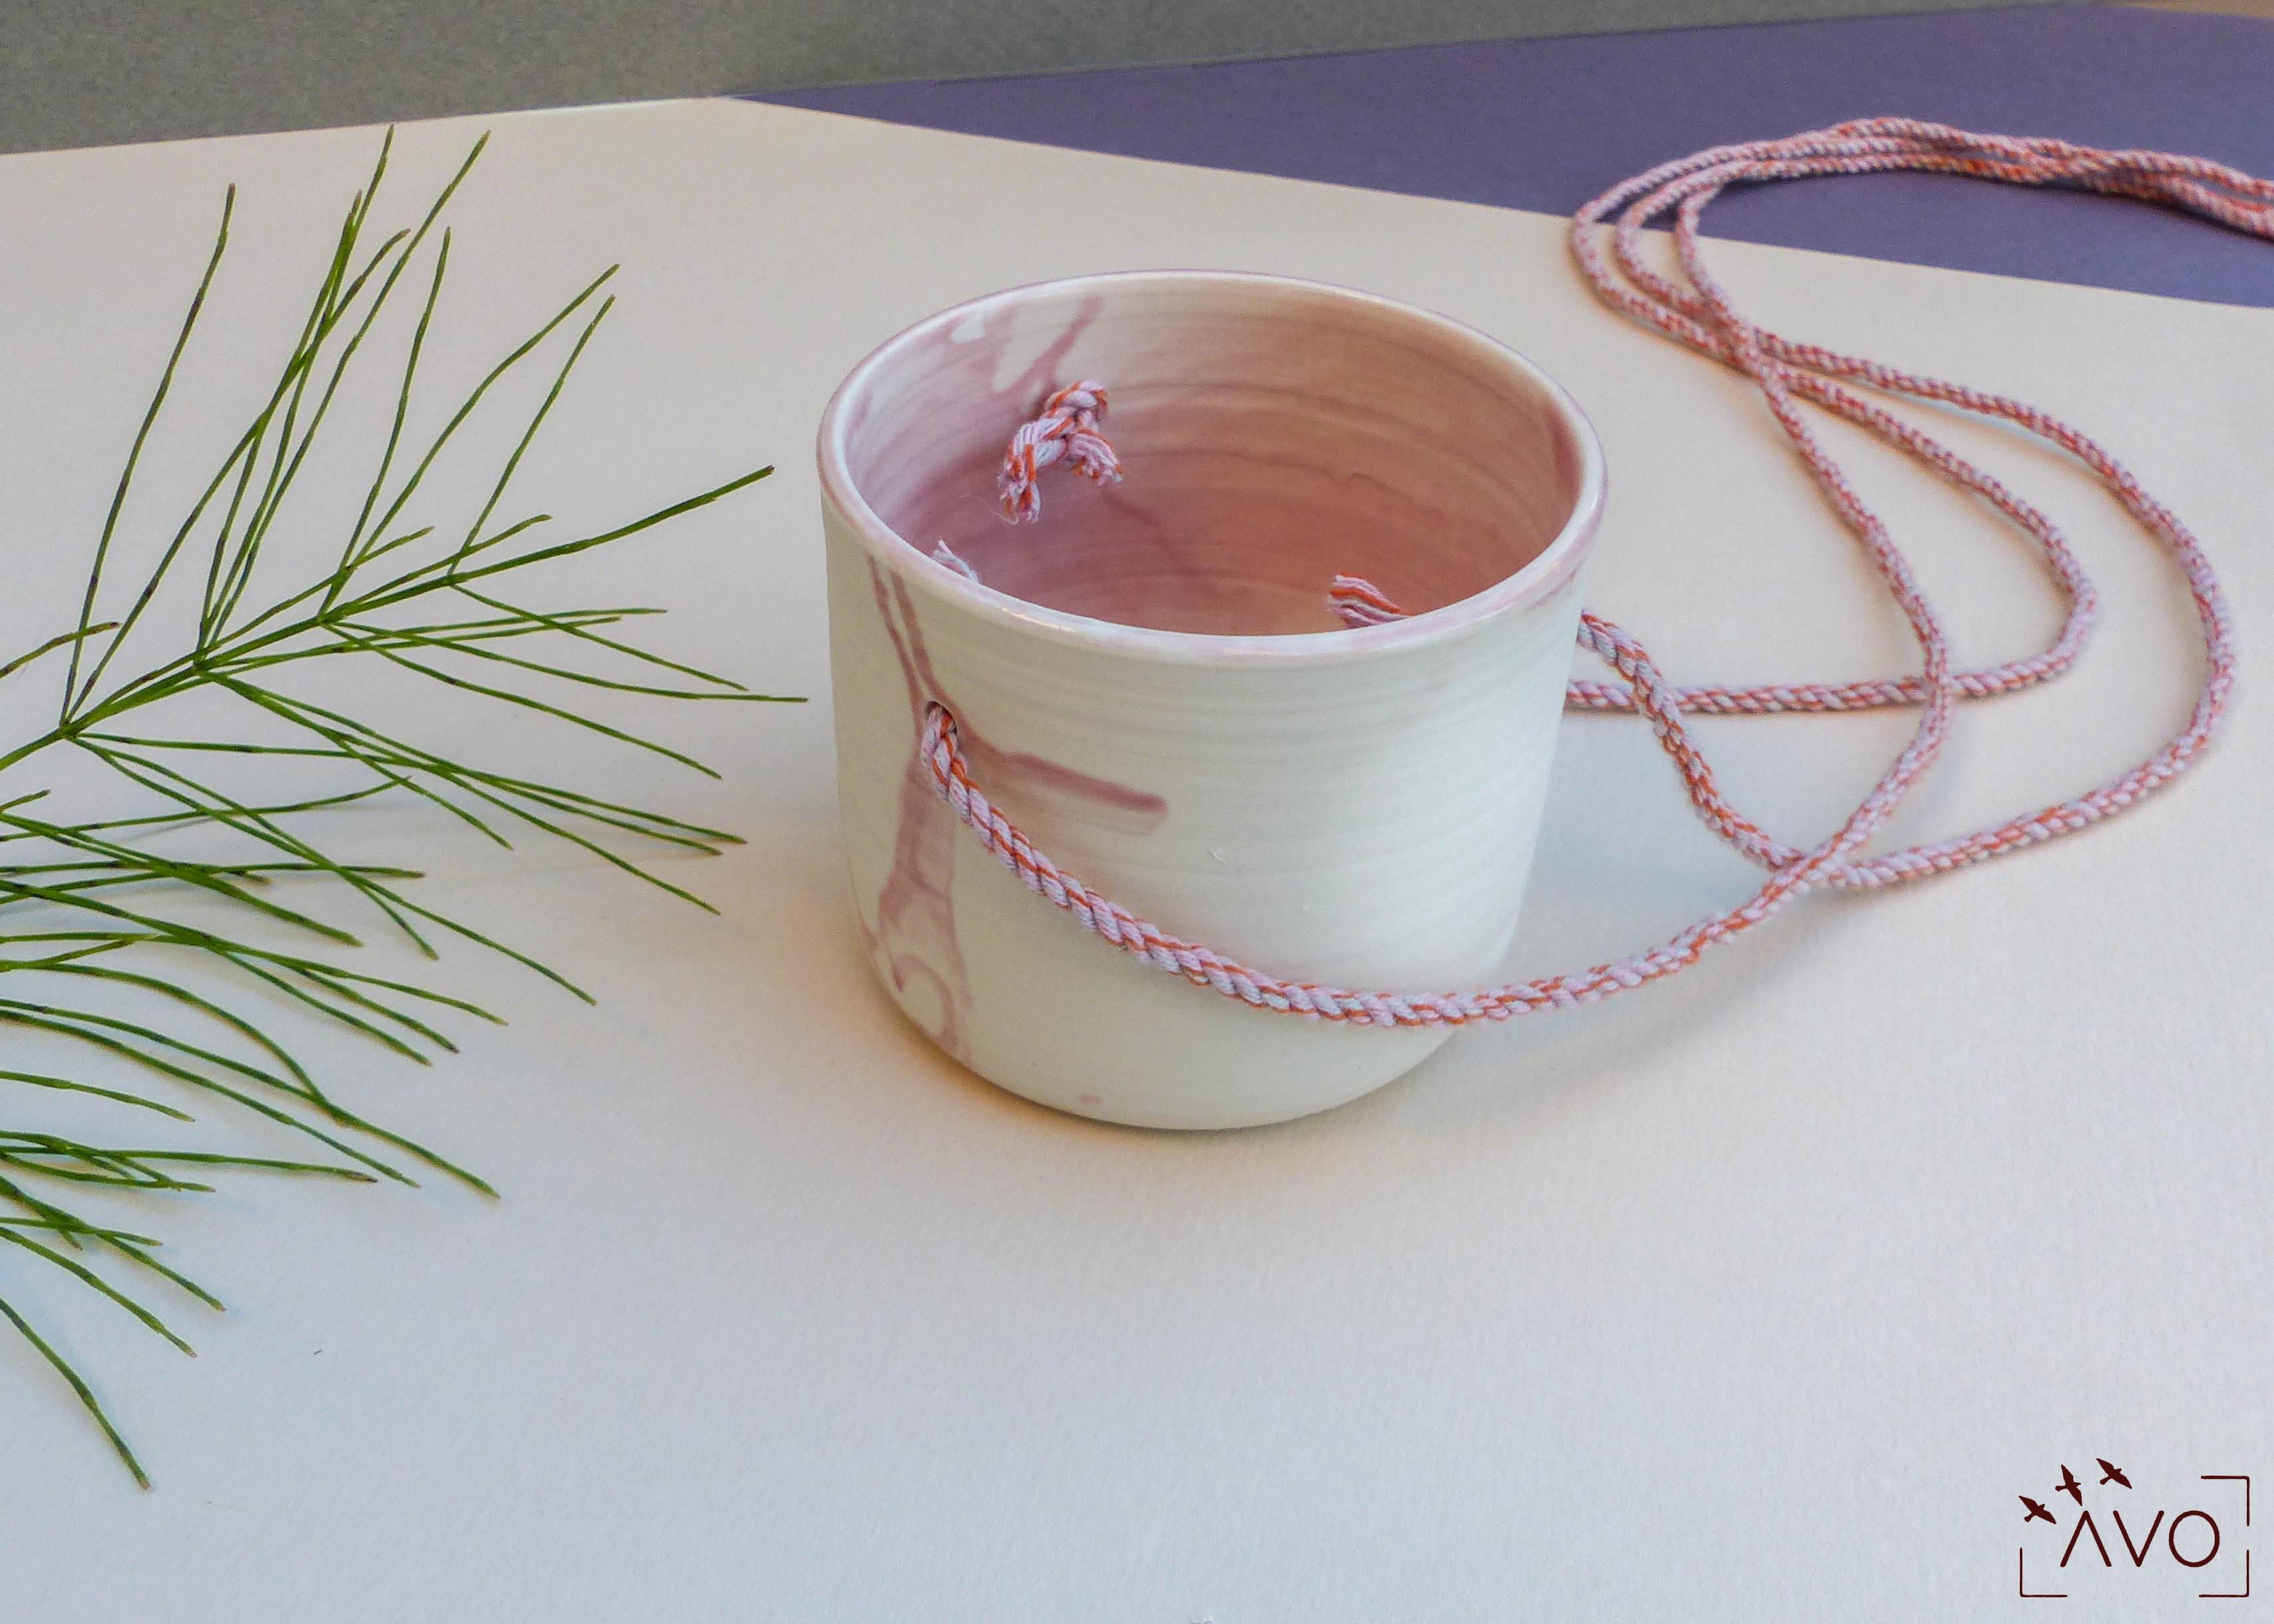 hortense-montarnal-ceramique-atelier-lyon-rose-porte-plante